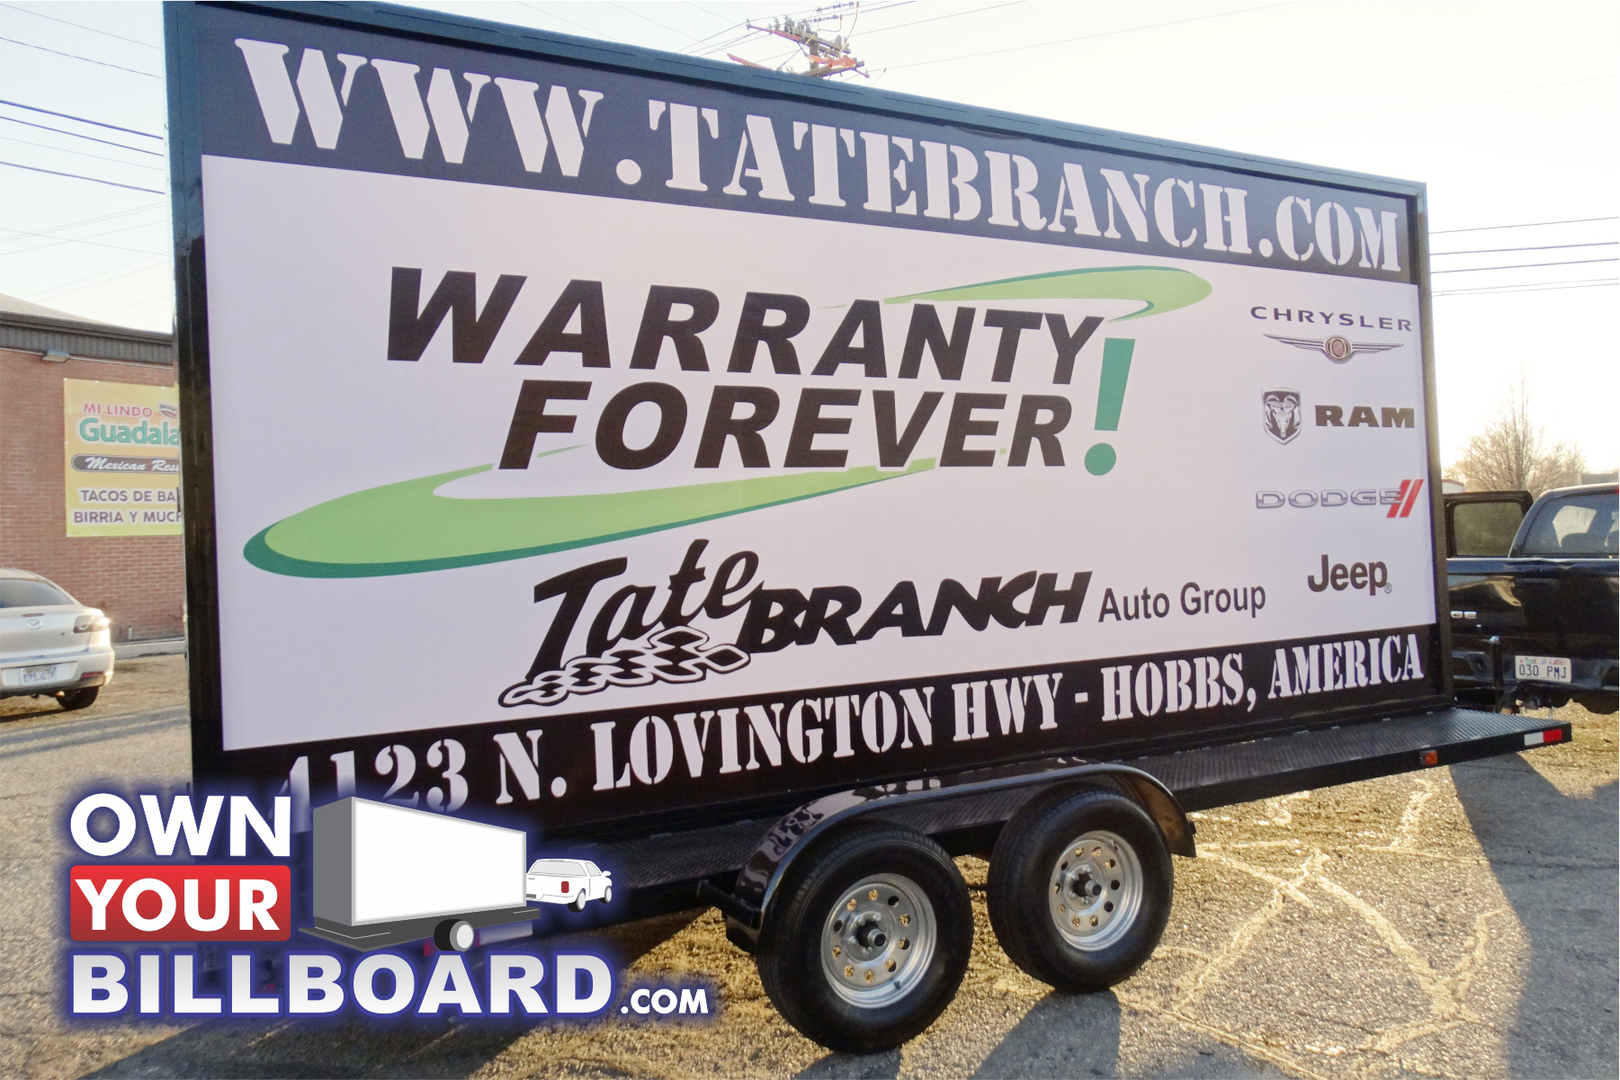 Mobile advertising, Billboard Trailers for sale, Billboards